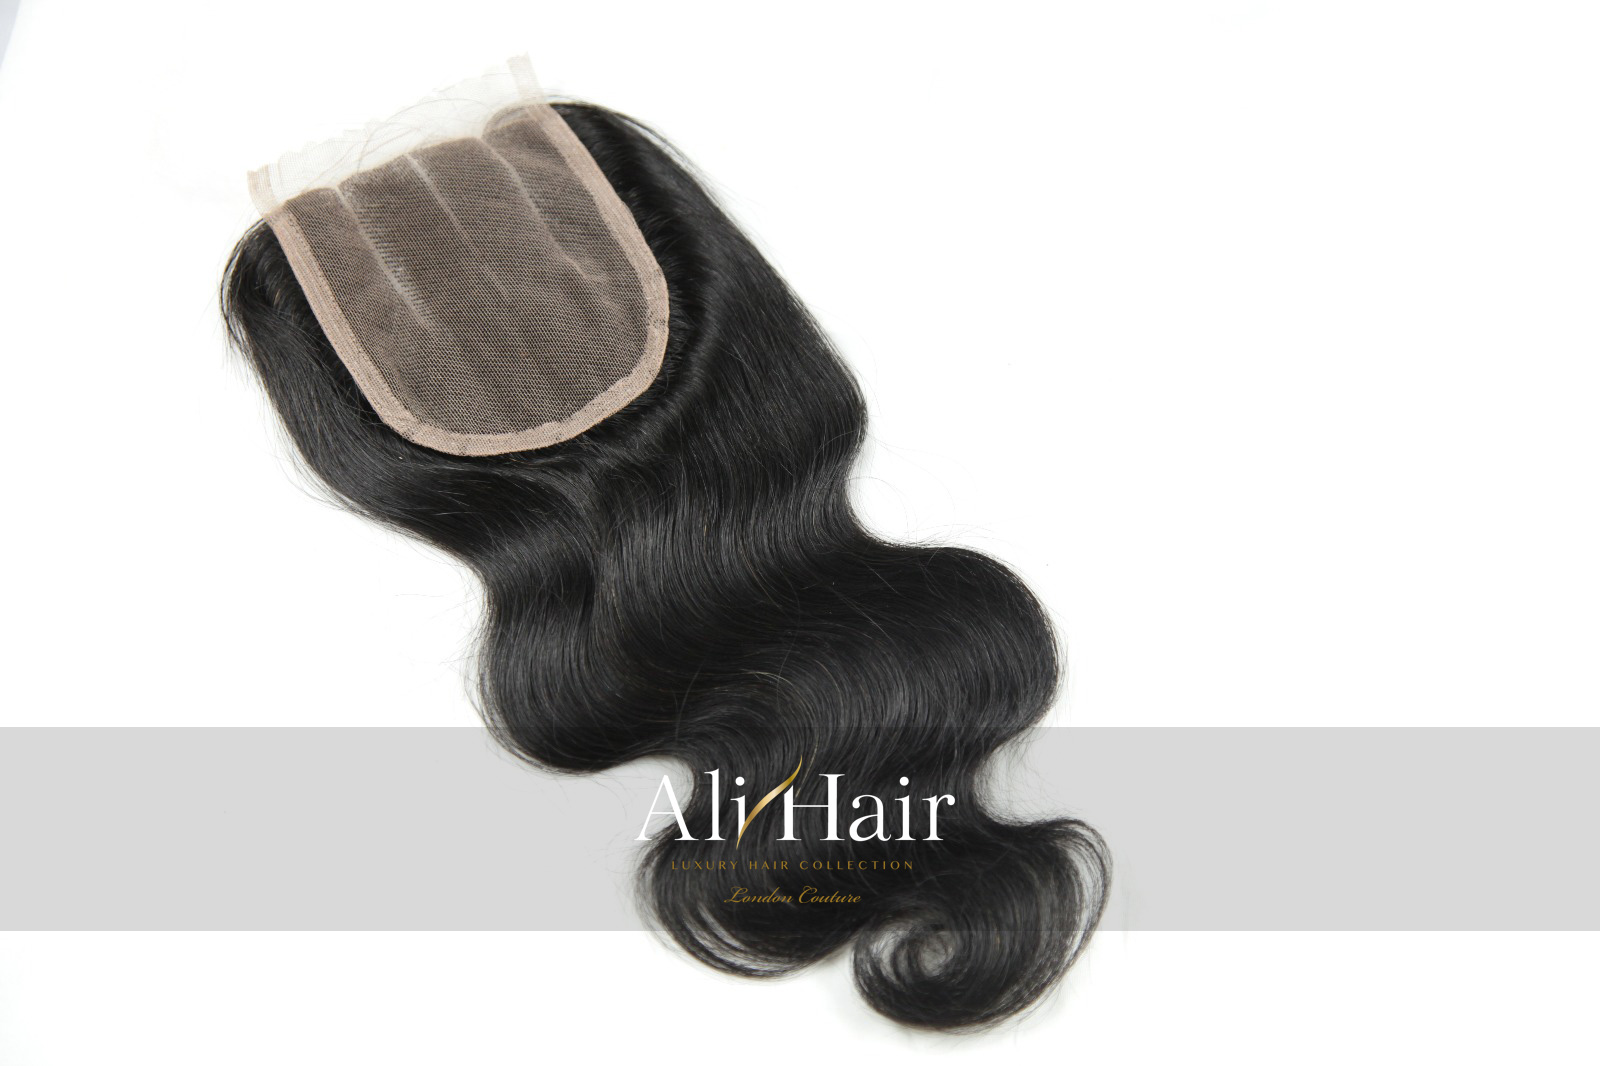 AliHair Brazilian Body Wave  Closure Human Gold Virgin Hair